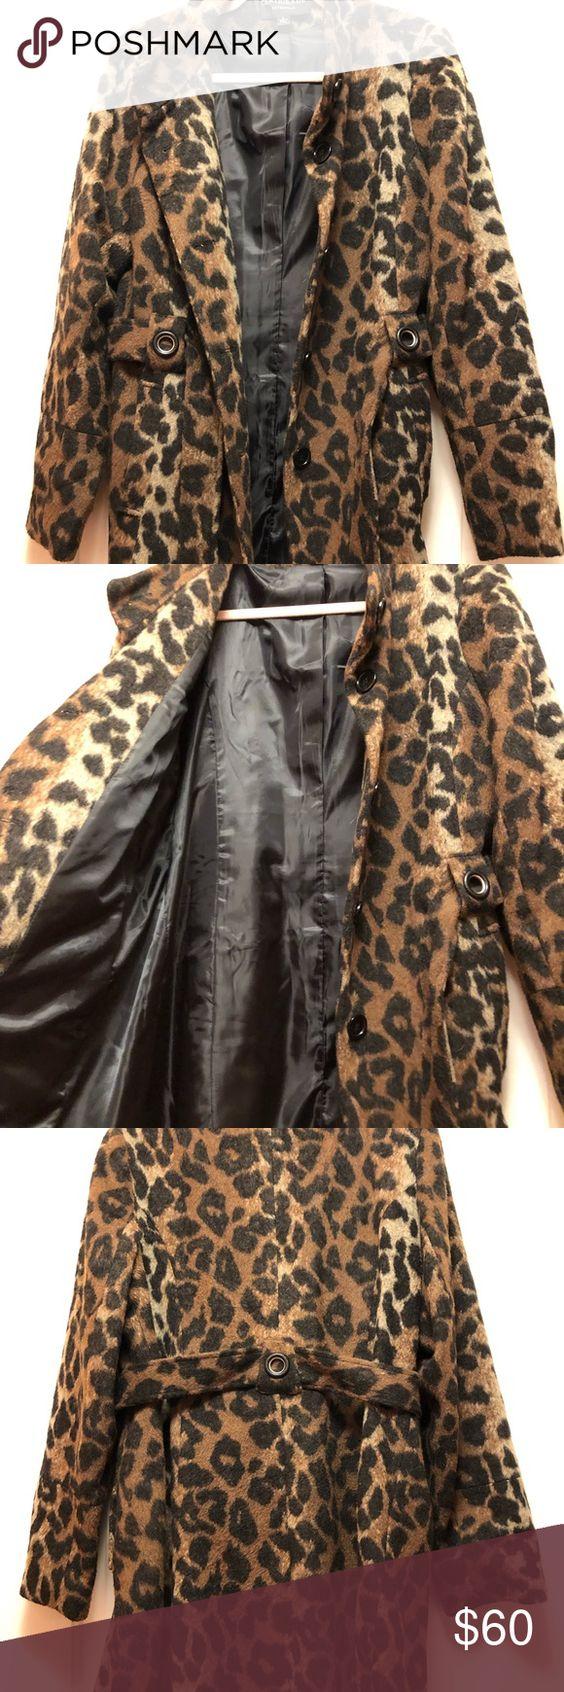 Lovely Centigrade Animal Print Coat Fashion Outerwear Women Clothes Design [ 1692 x 564 Pixel ]